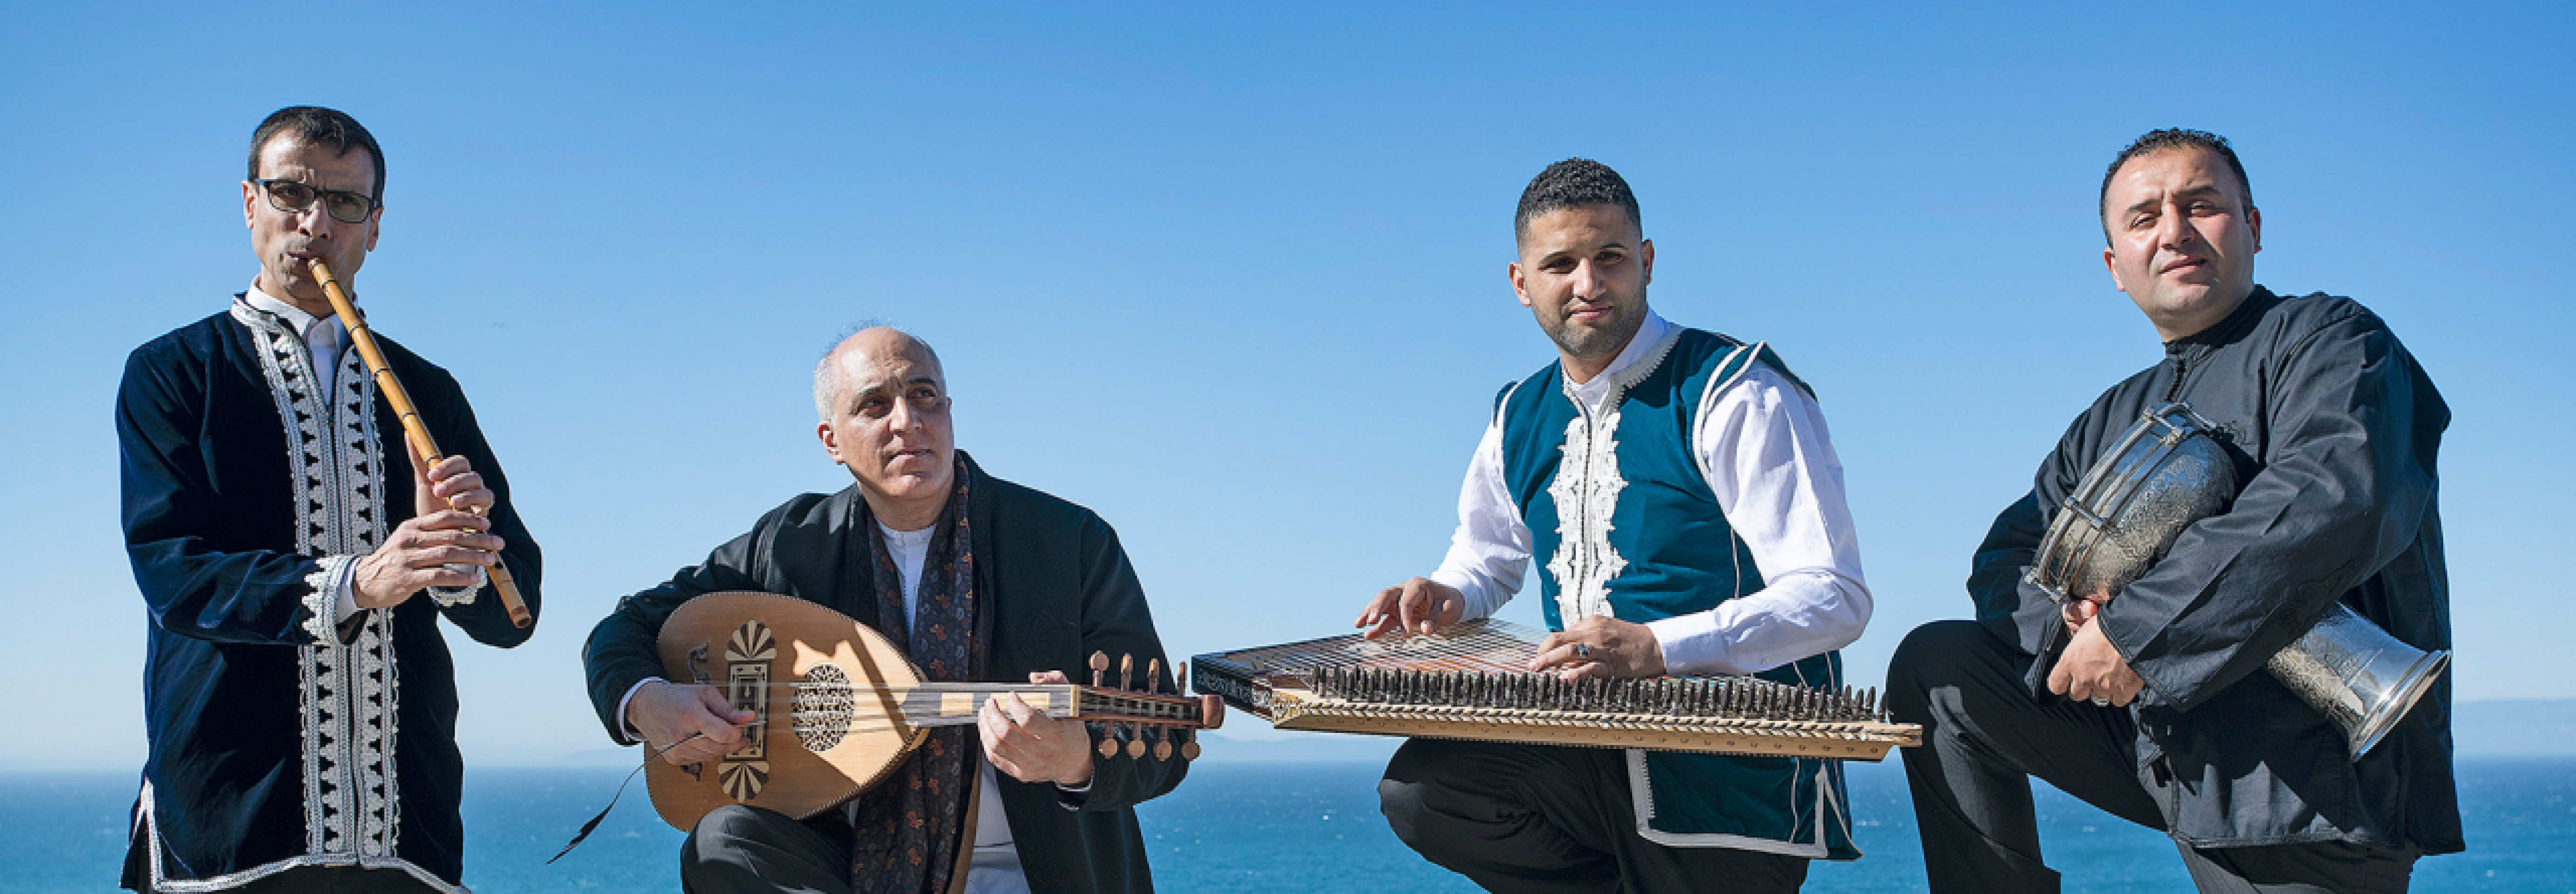 Concertgebouw – Omar Metioui: Al Aramawi & rawafid ft. Amsterdams Andalusisch Orkest